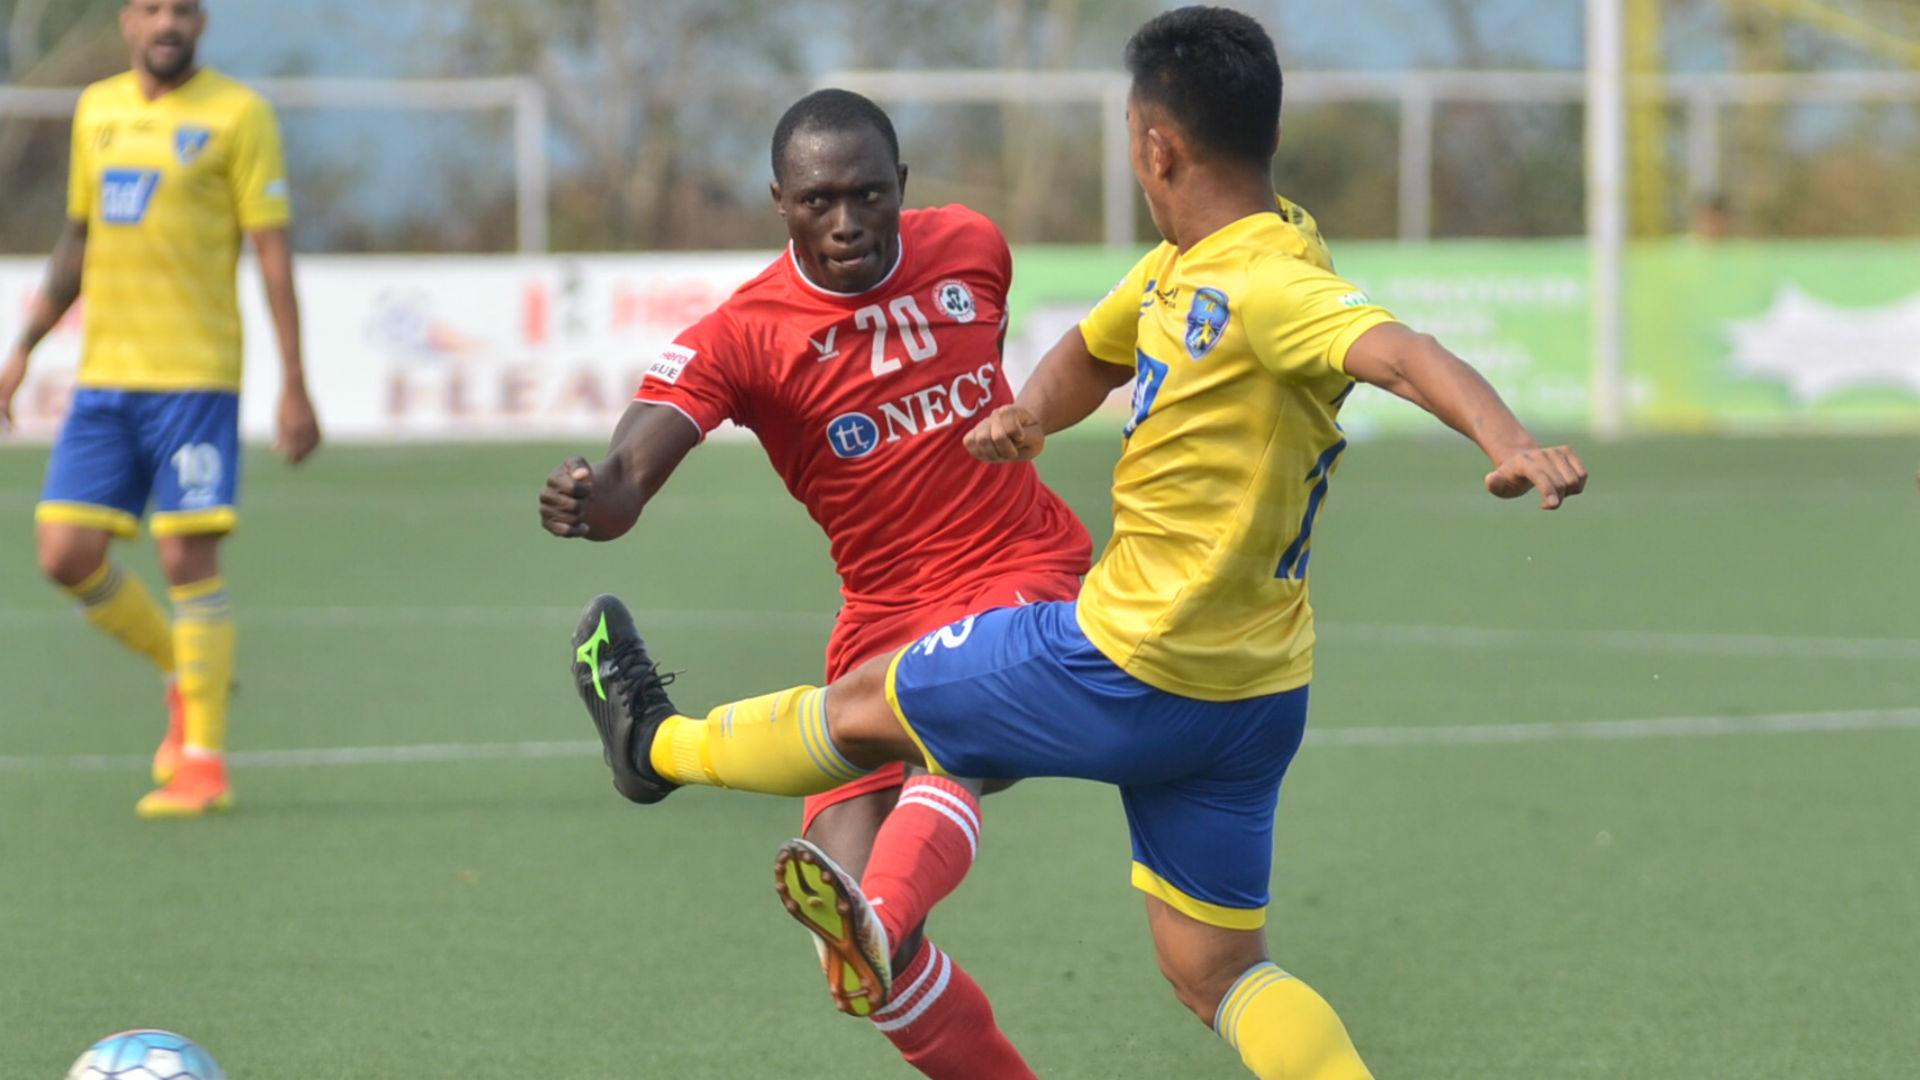 Alfred Jaryan Aizawl FC I-League 2017